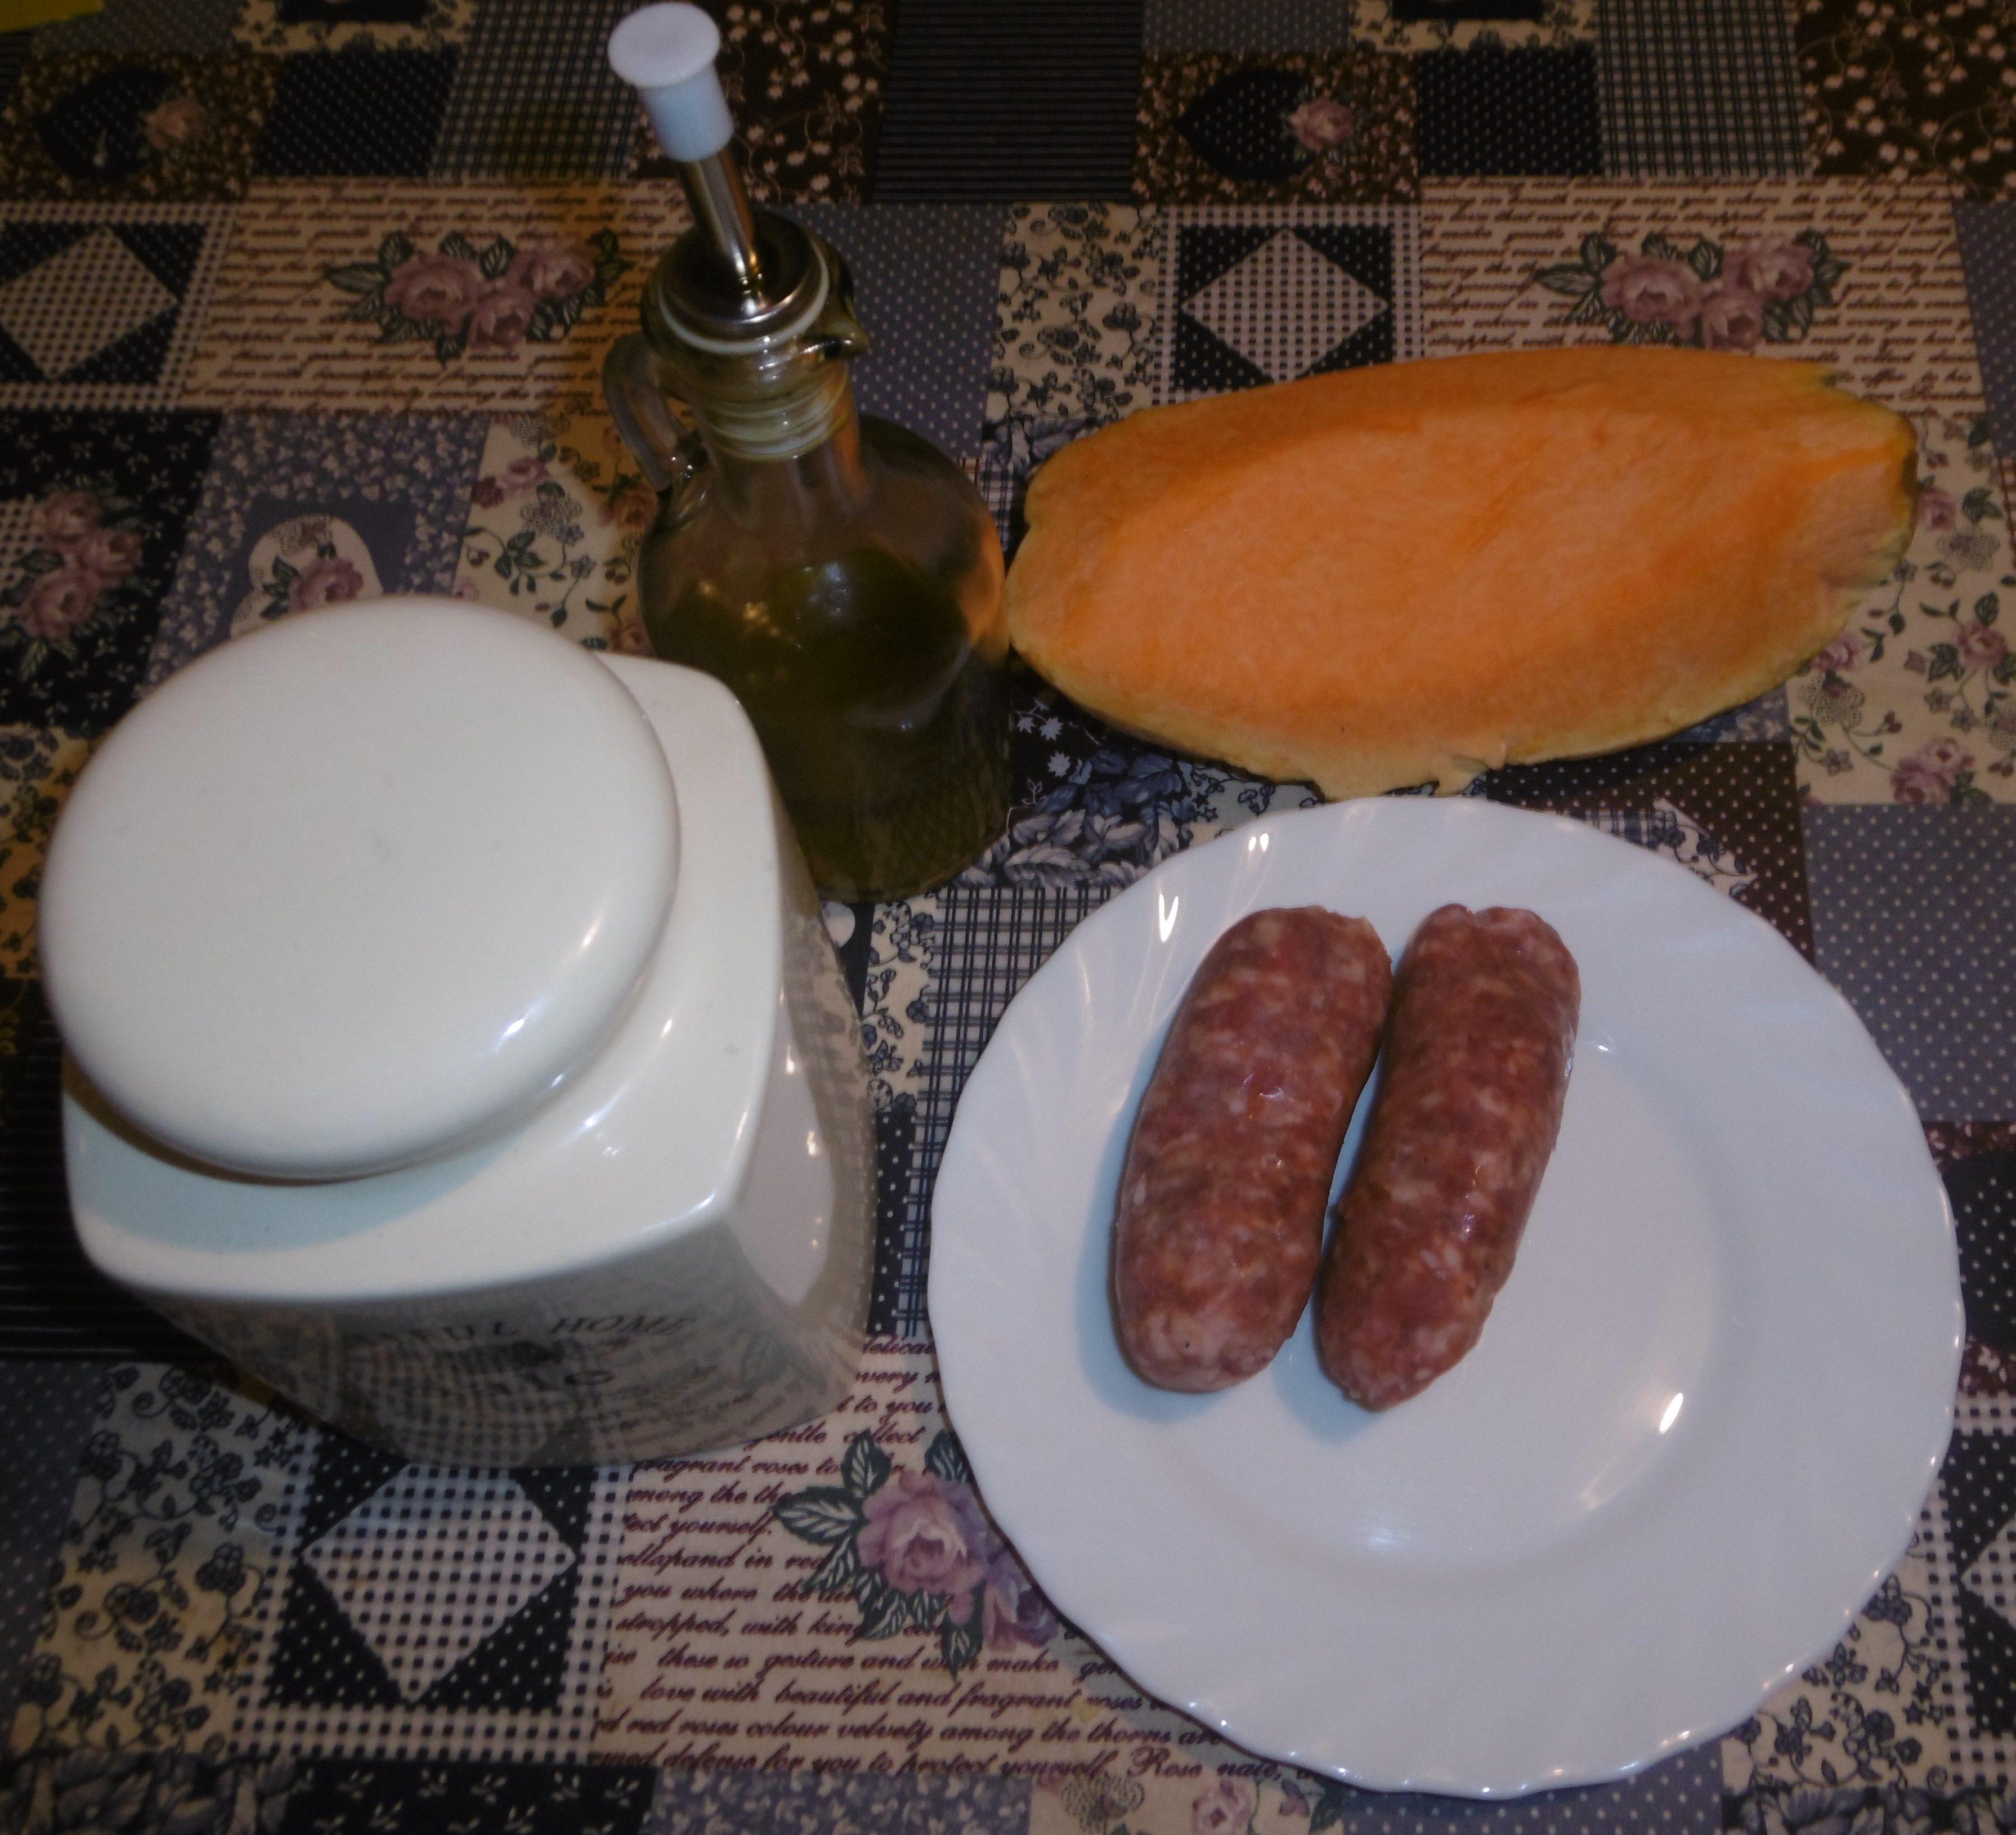 Gnocchi con zucca e salsiccia - Ingredienti